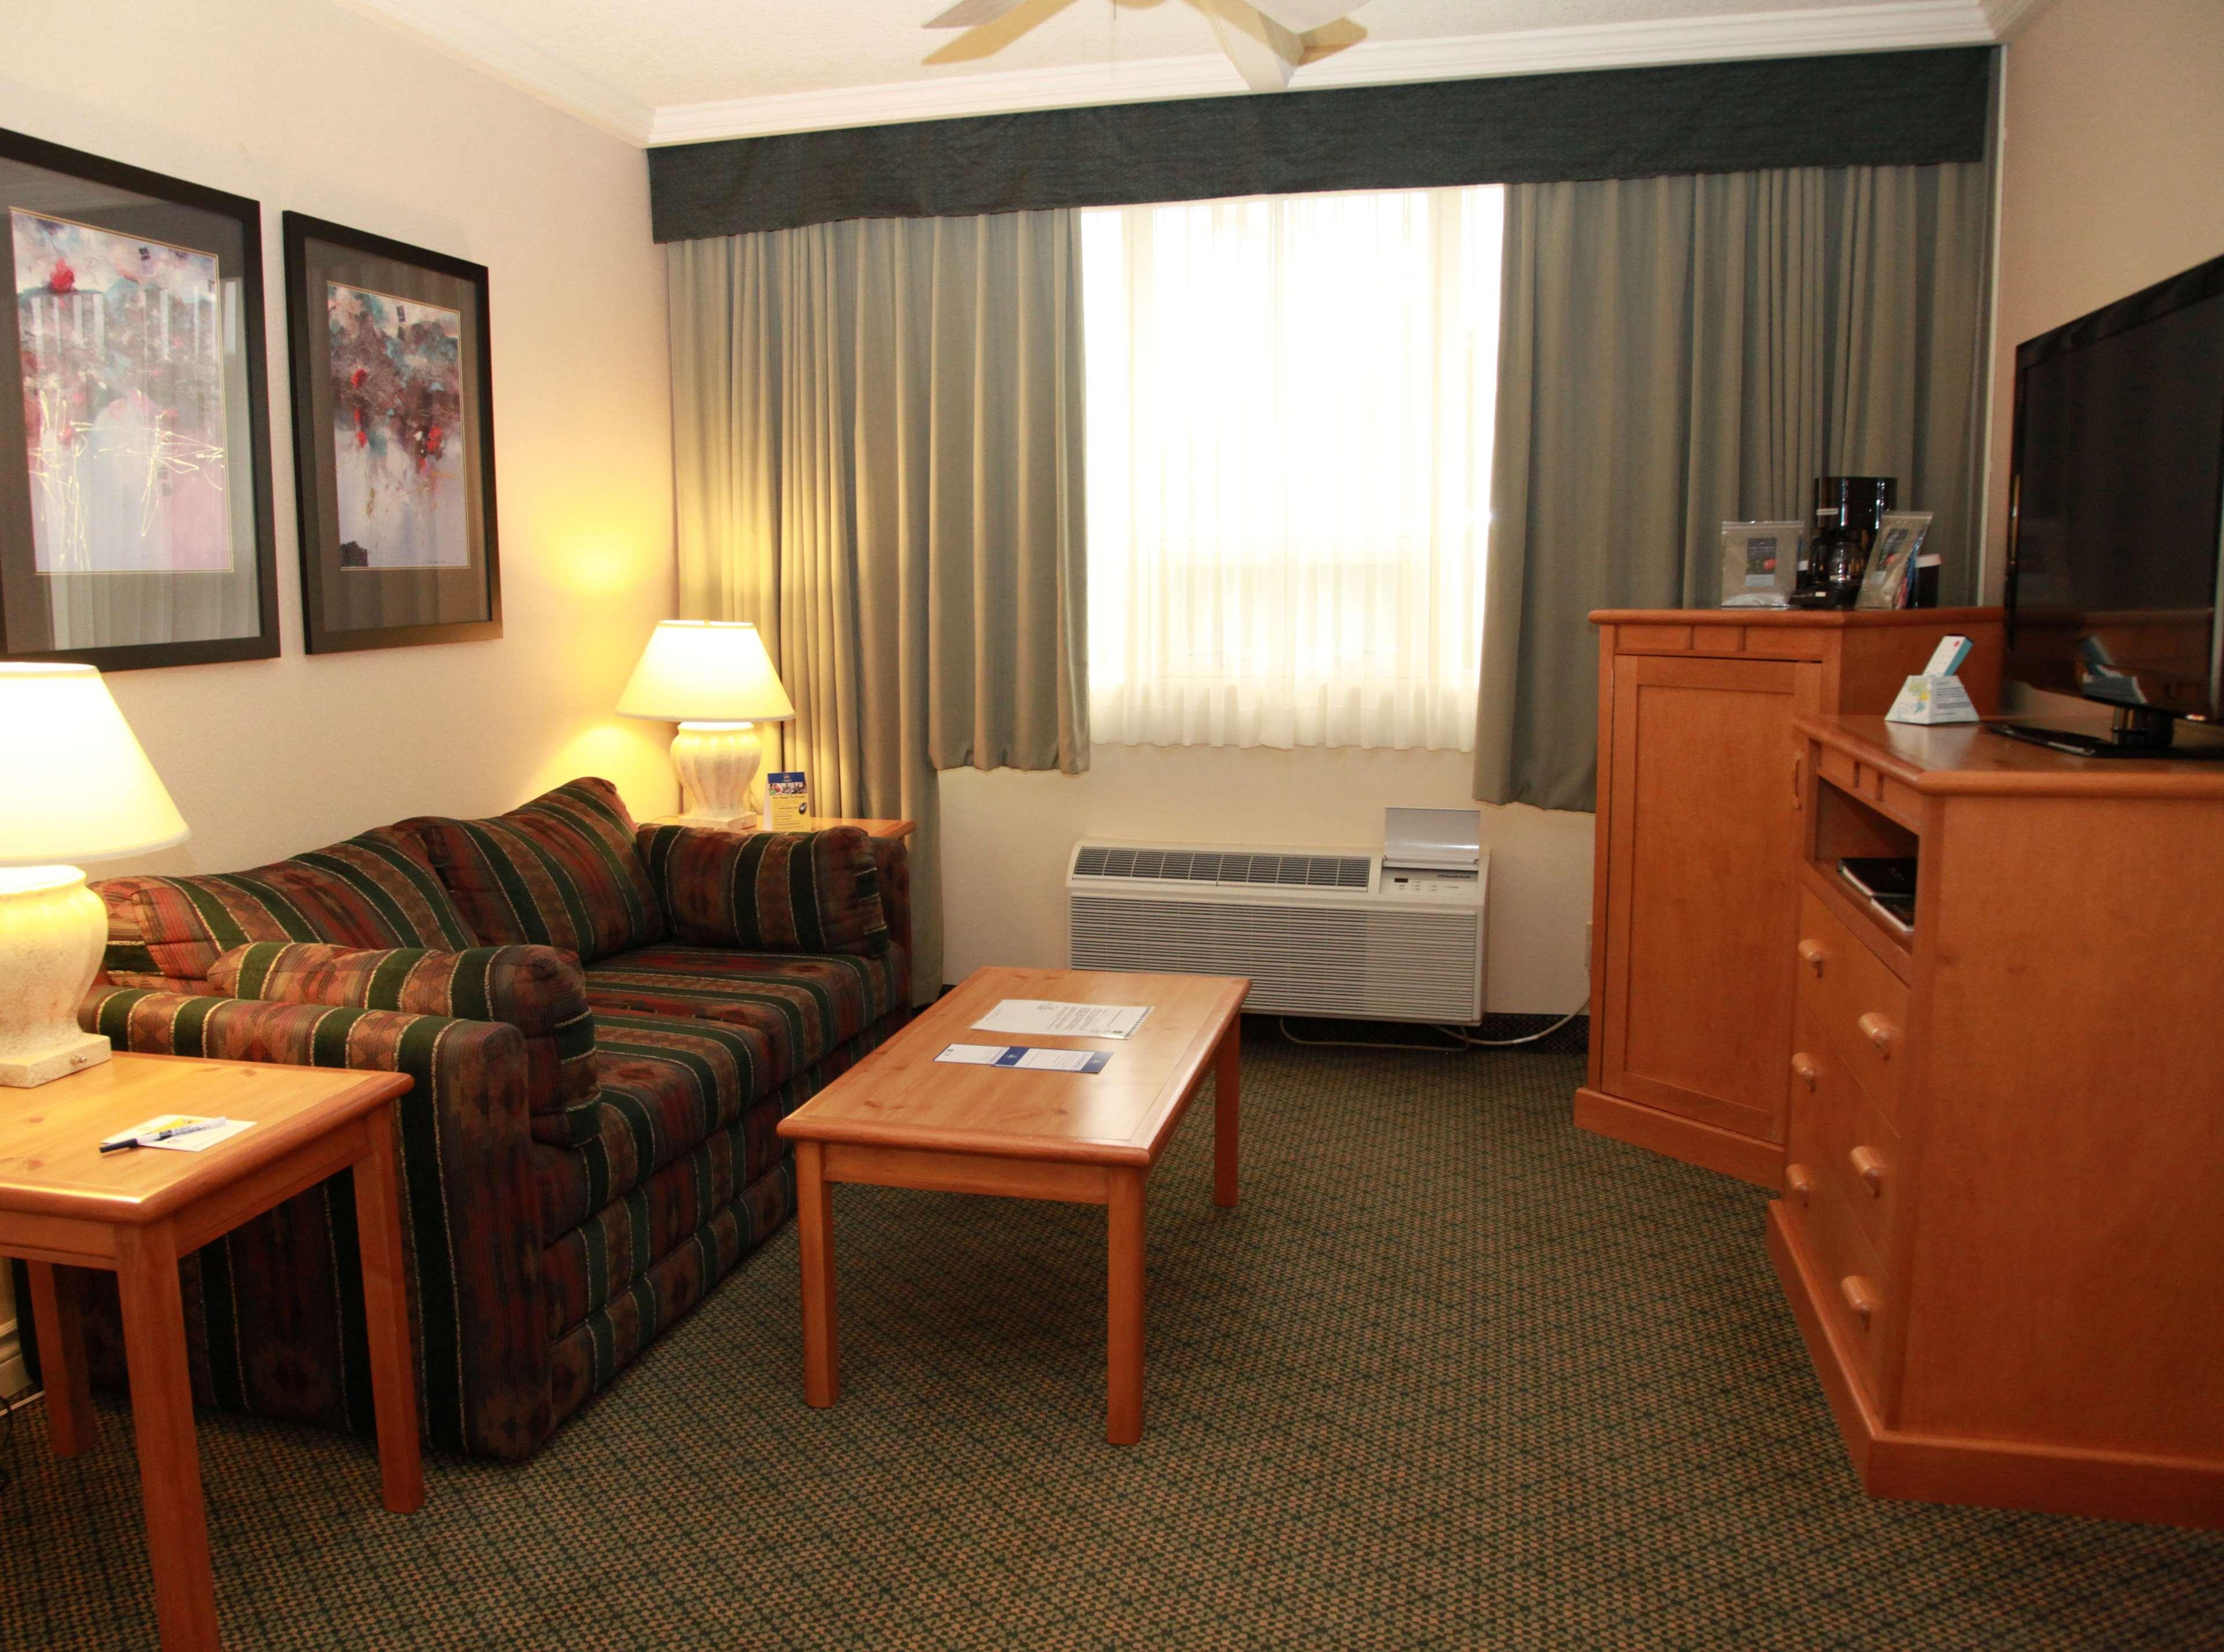 Best Western Plus Barclay Hotel in Port Alberni: Honeymoon Suite Sitting Area